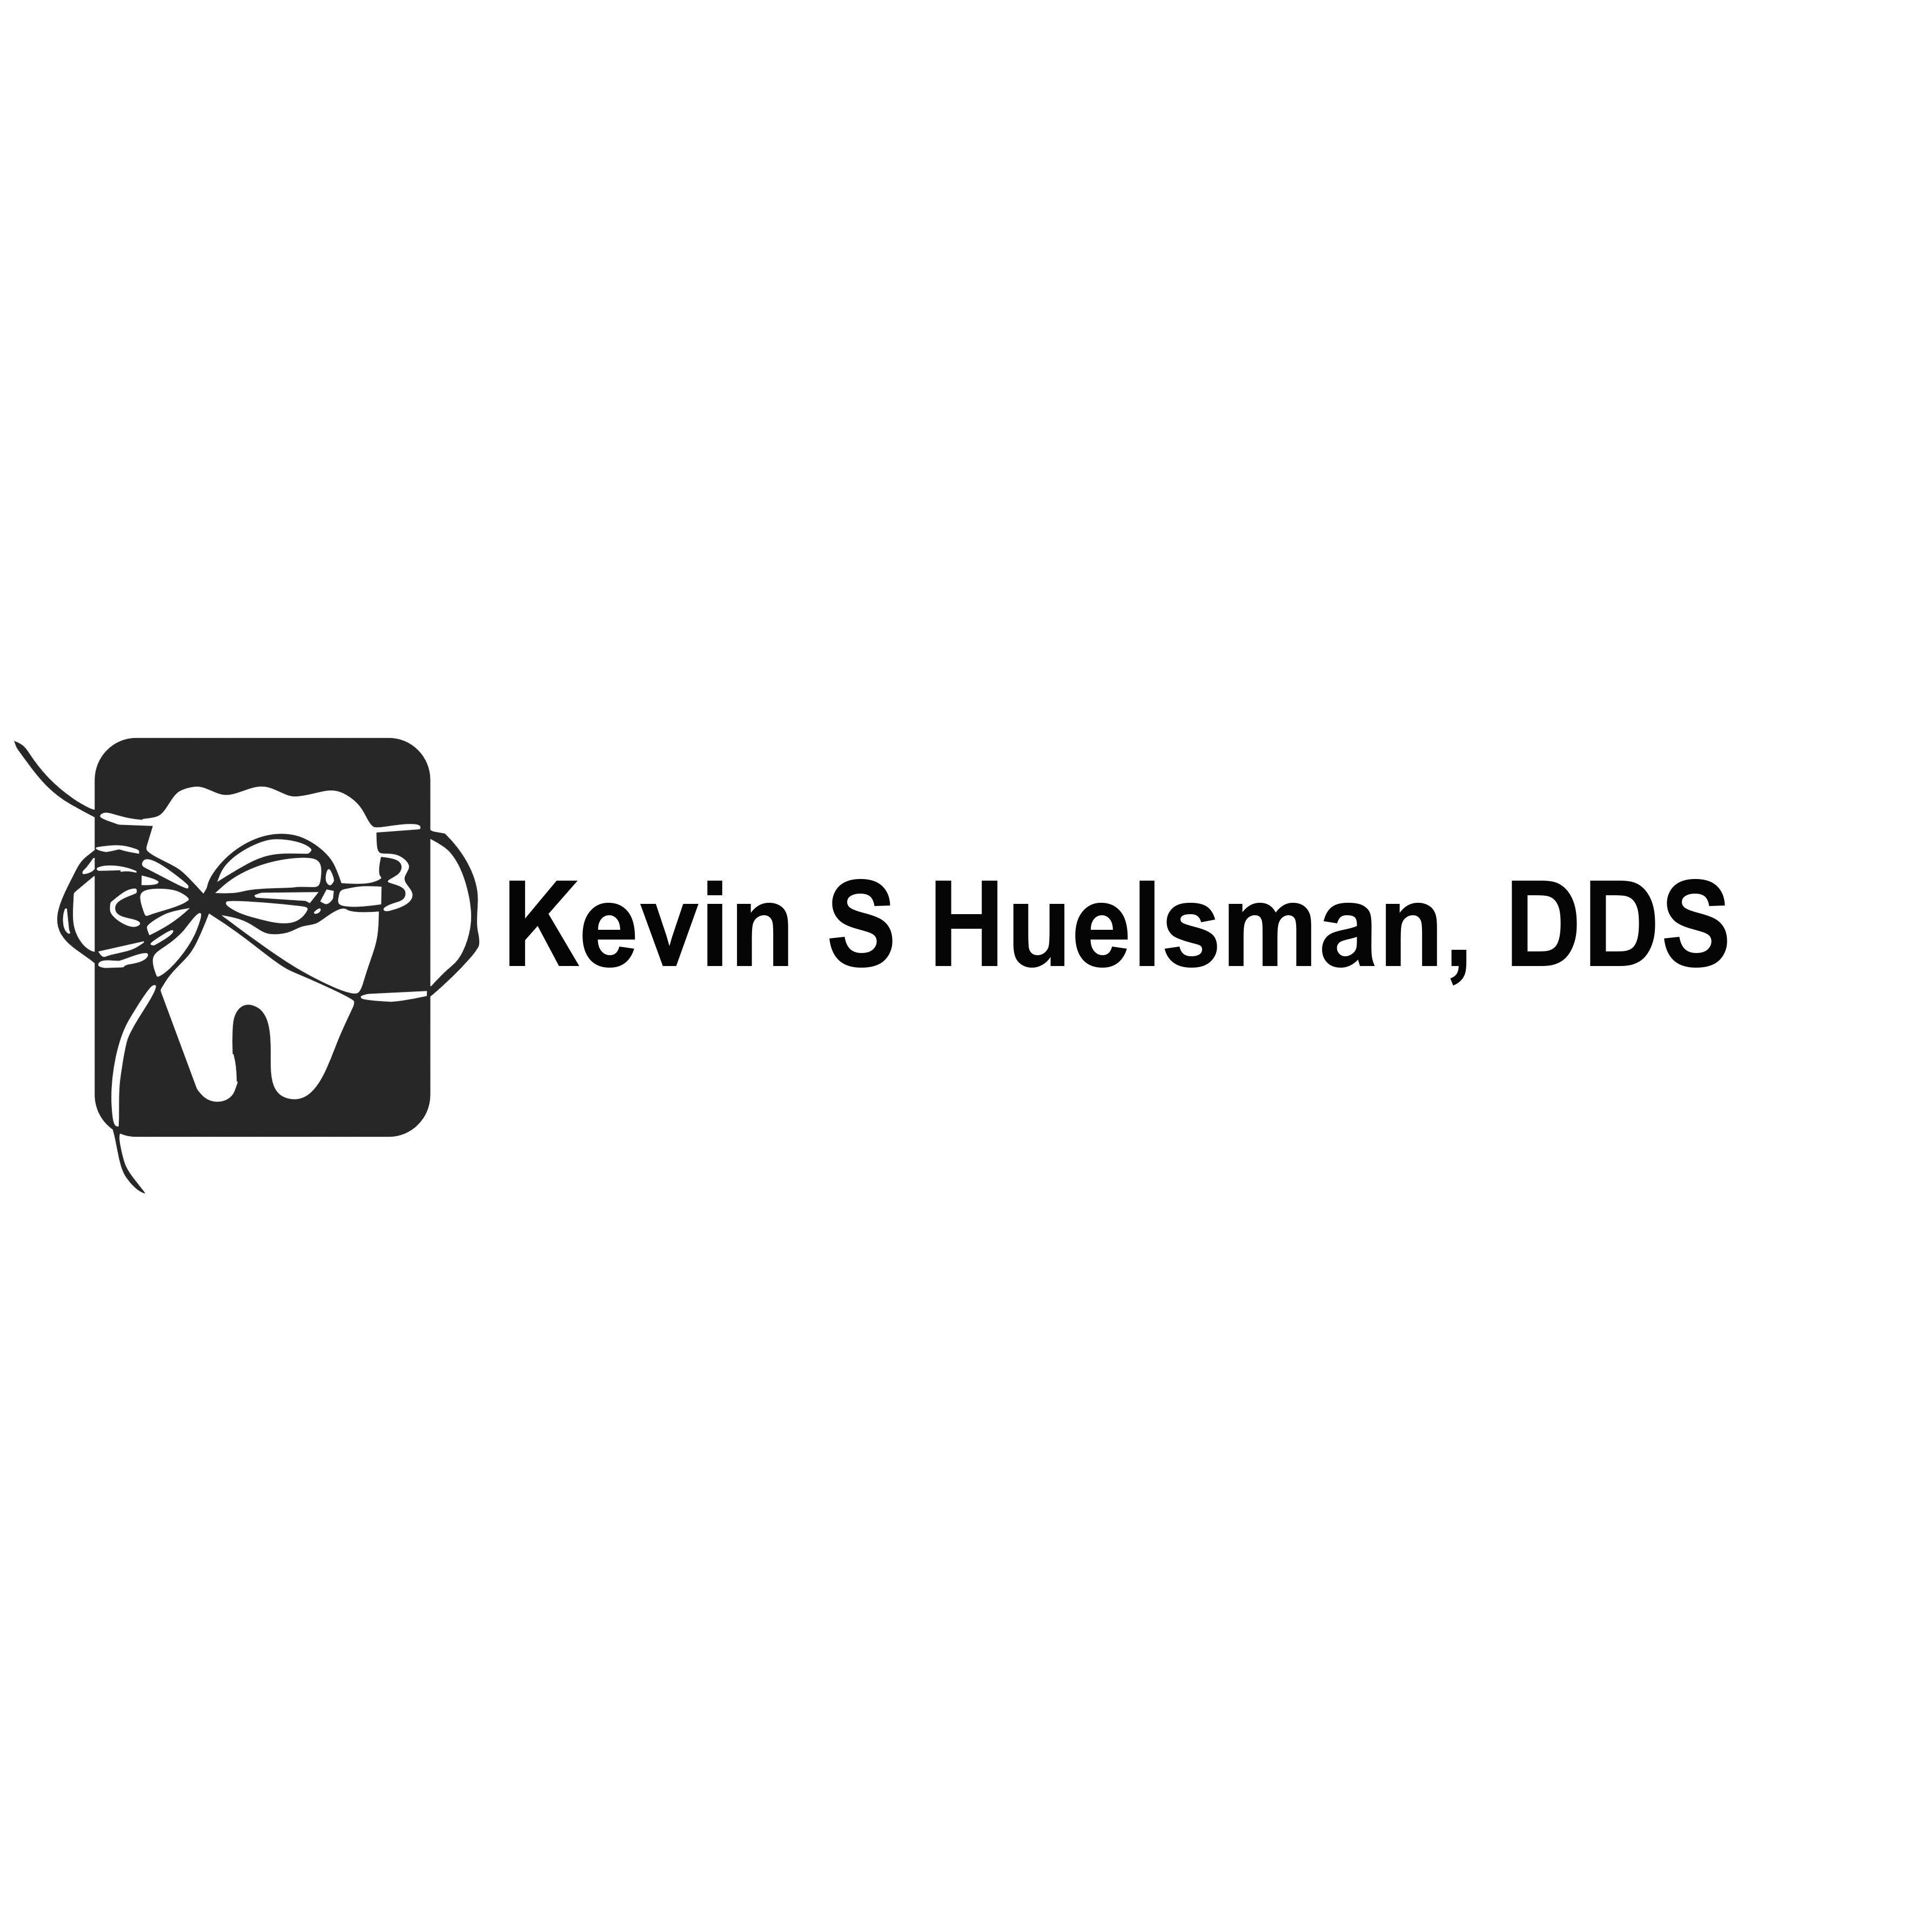 Kevin S Huelsman, DDS